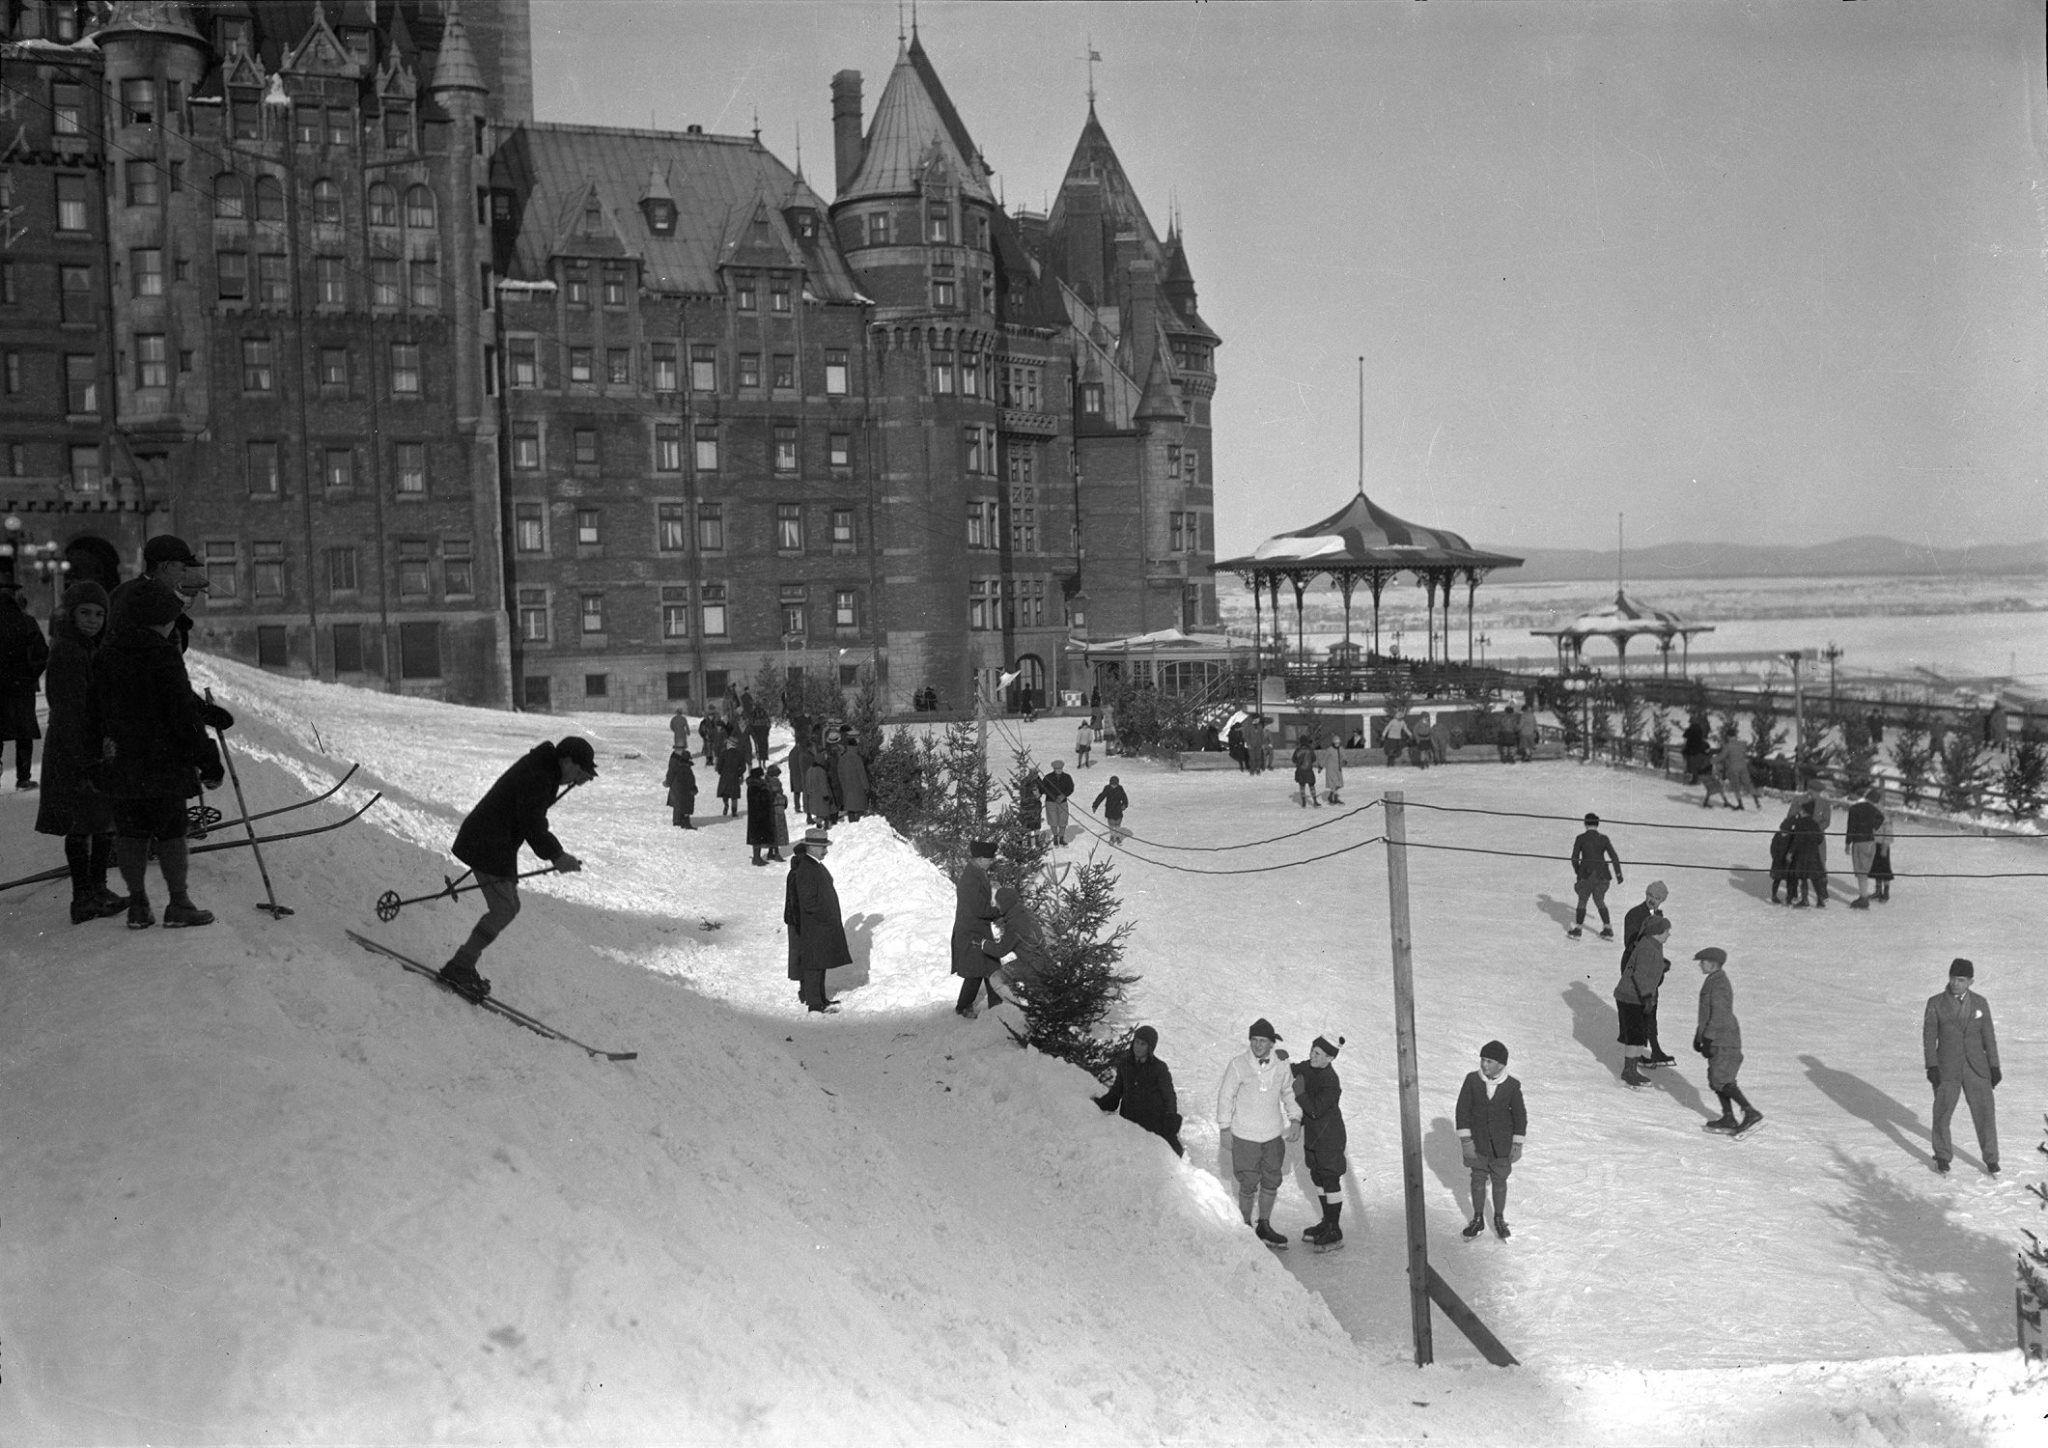 Terrasse Vintage : Plaisirs d u0026#39;hiver d u0026#39;antan sur la Terrasse Dufferin